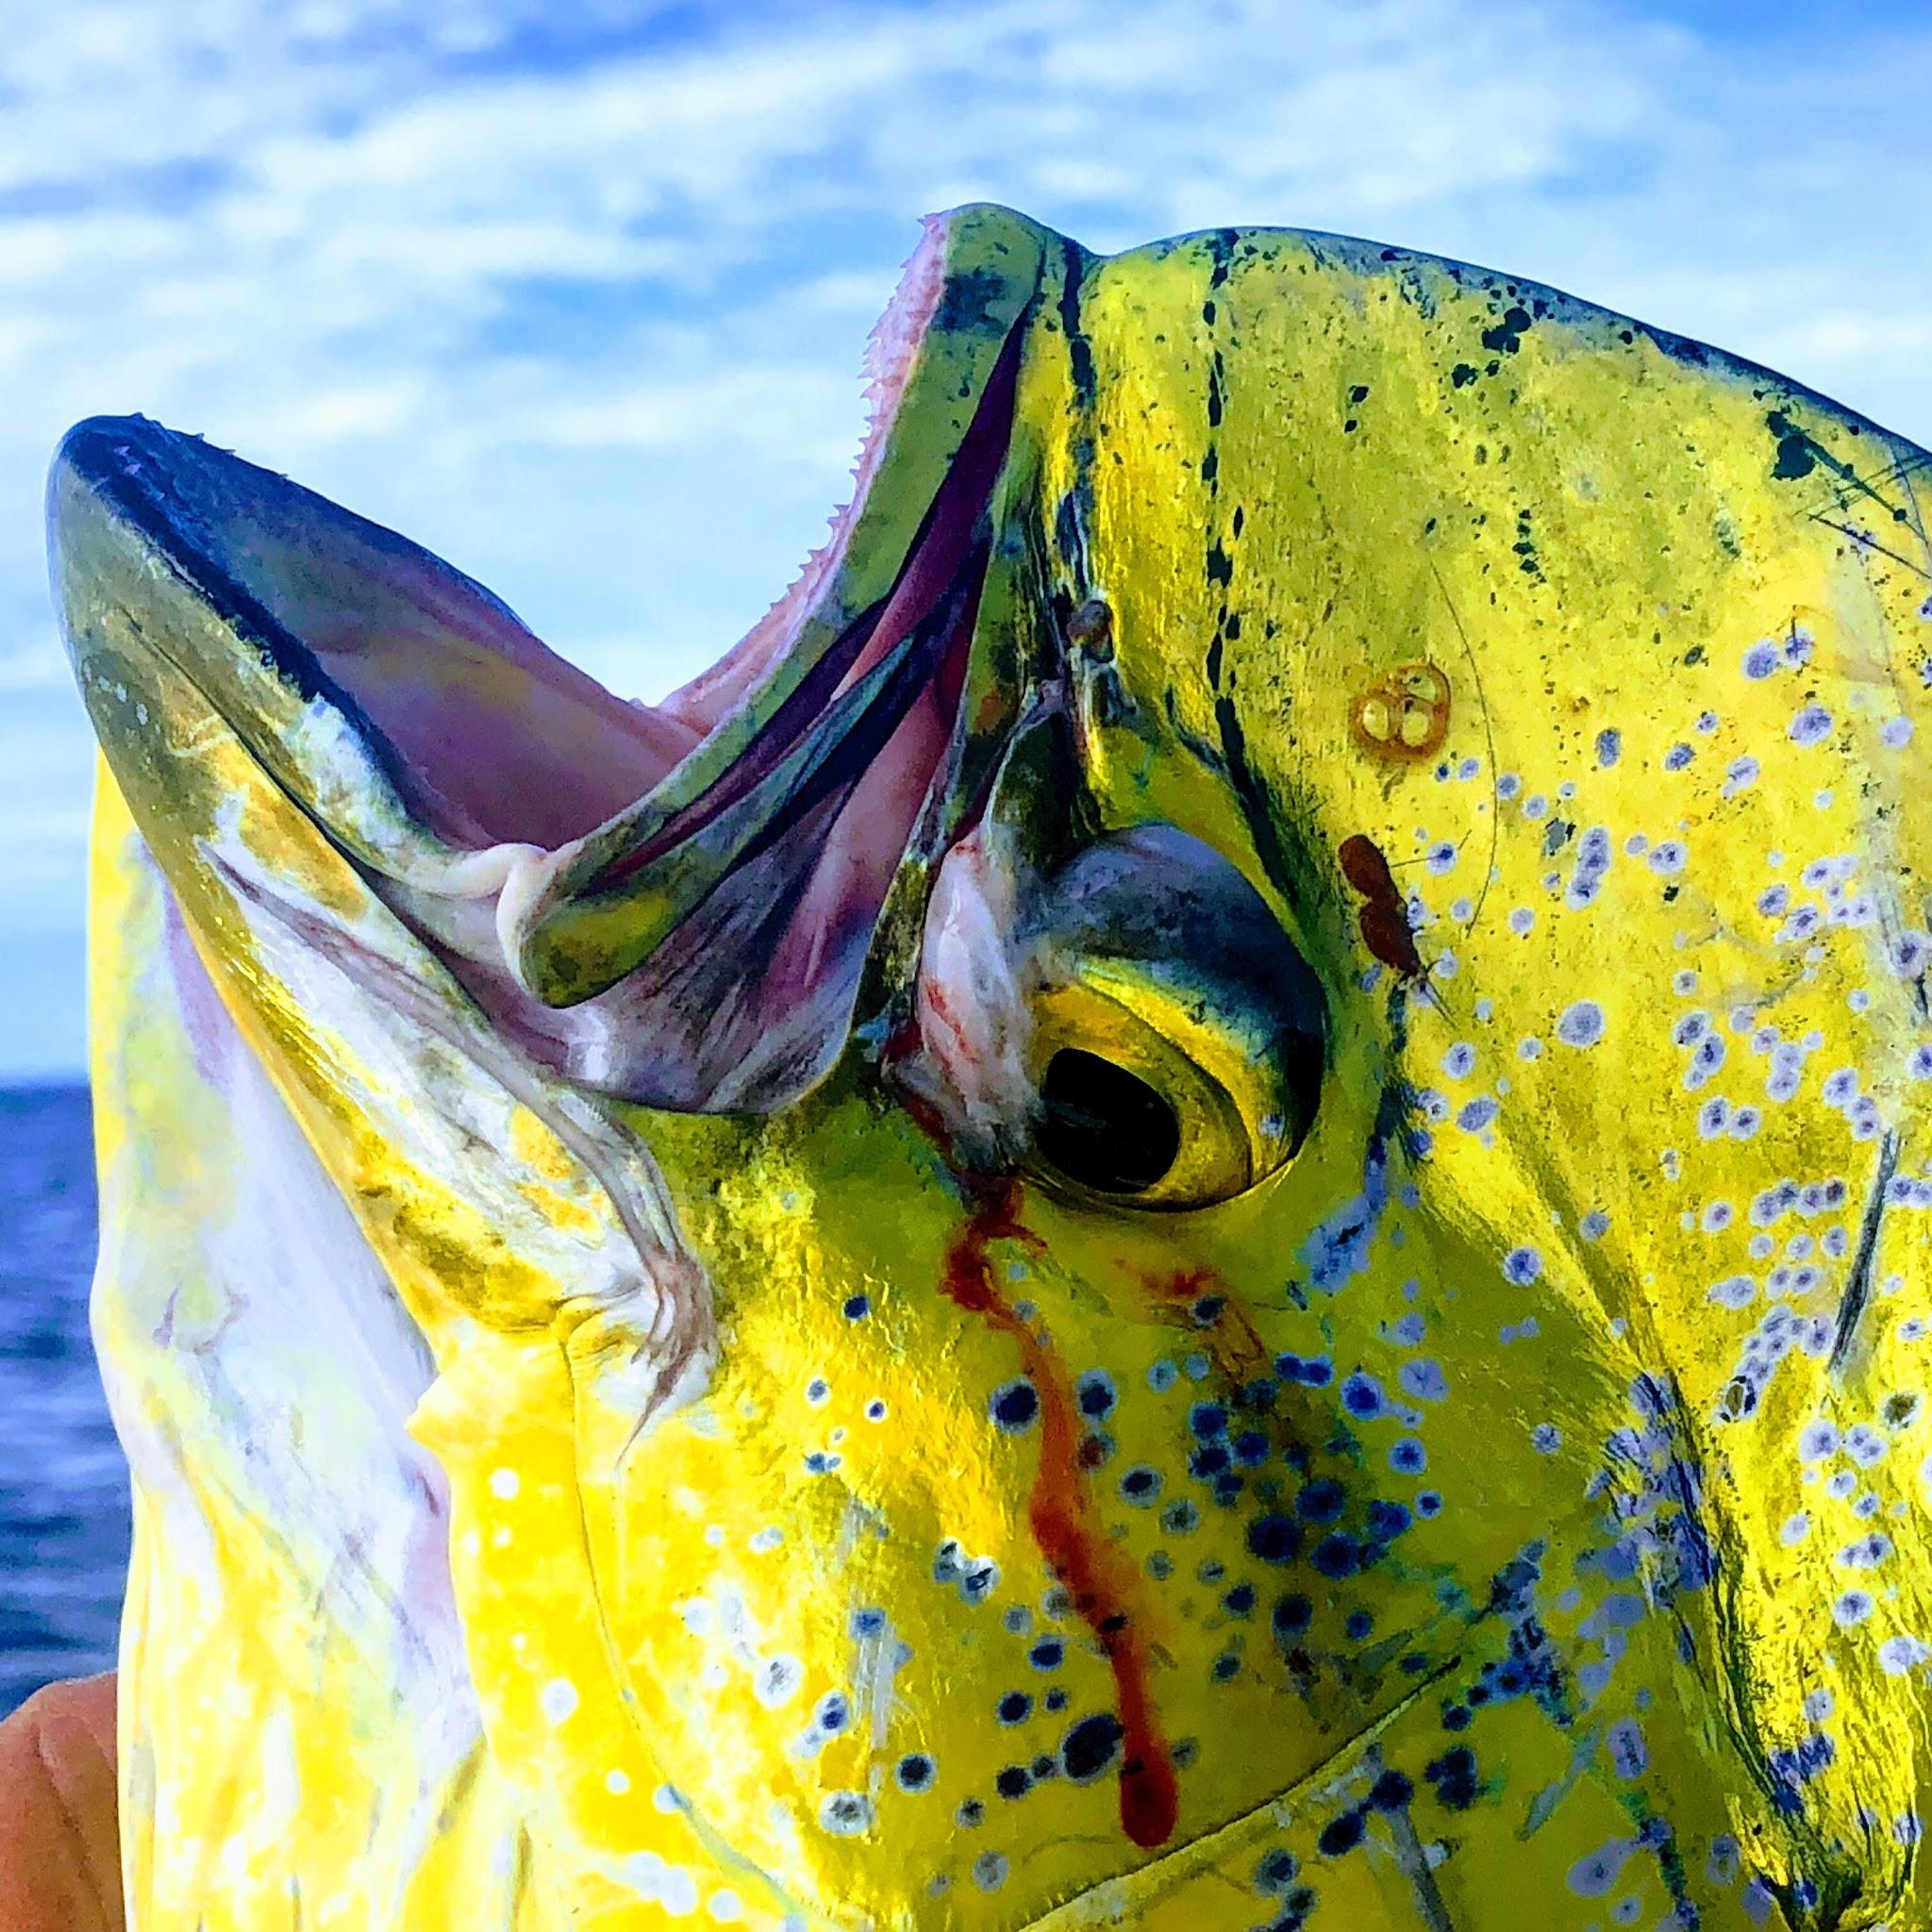 Angler's Choice Fishing Report